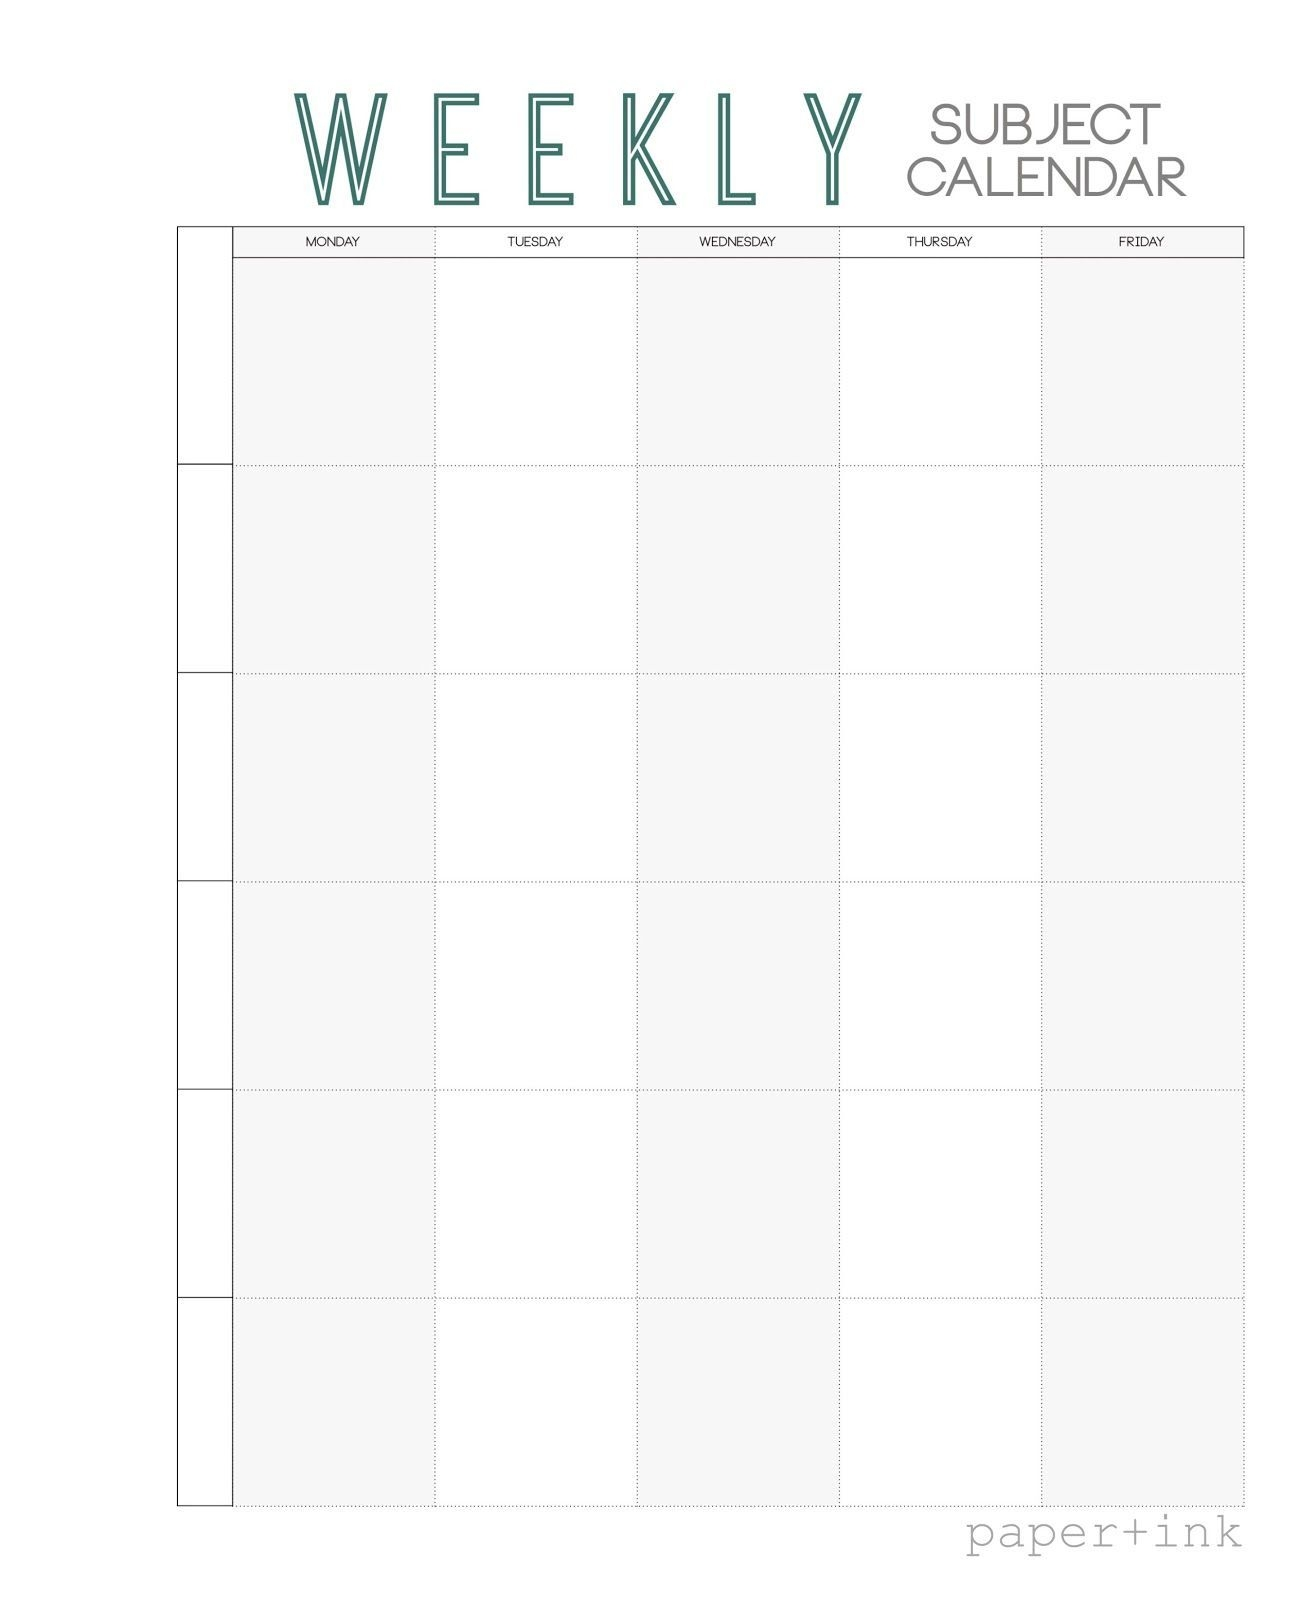 Free Weekly Subject Calendar | School Calendar, Weekly